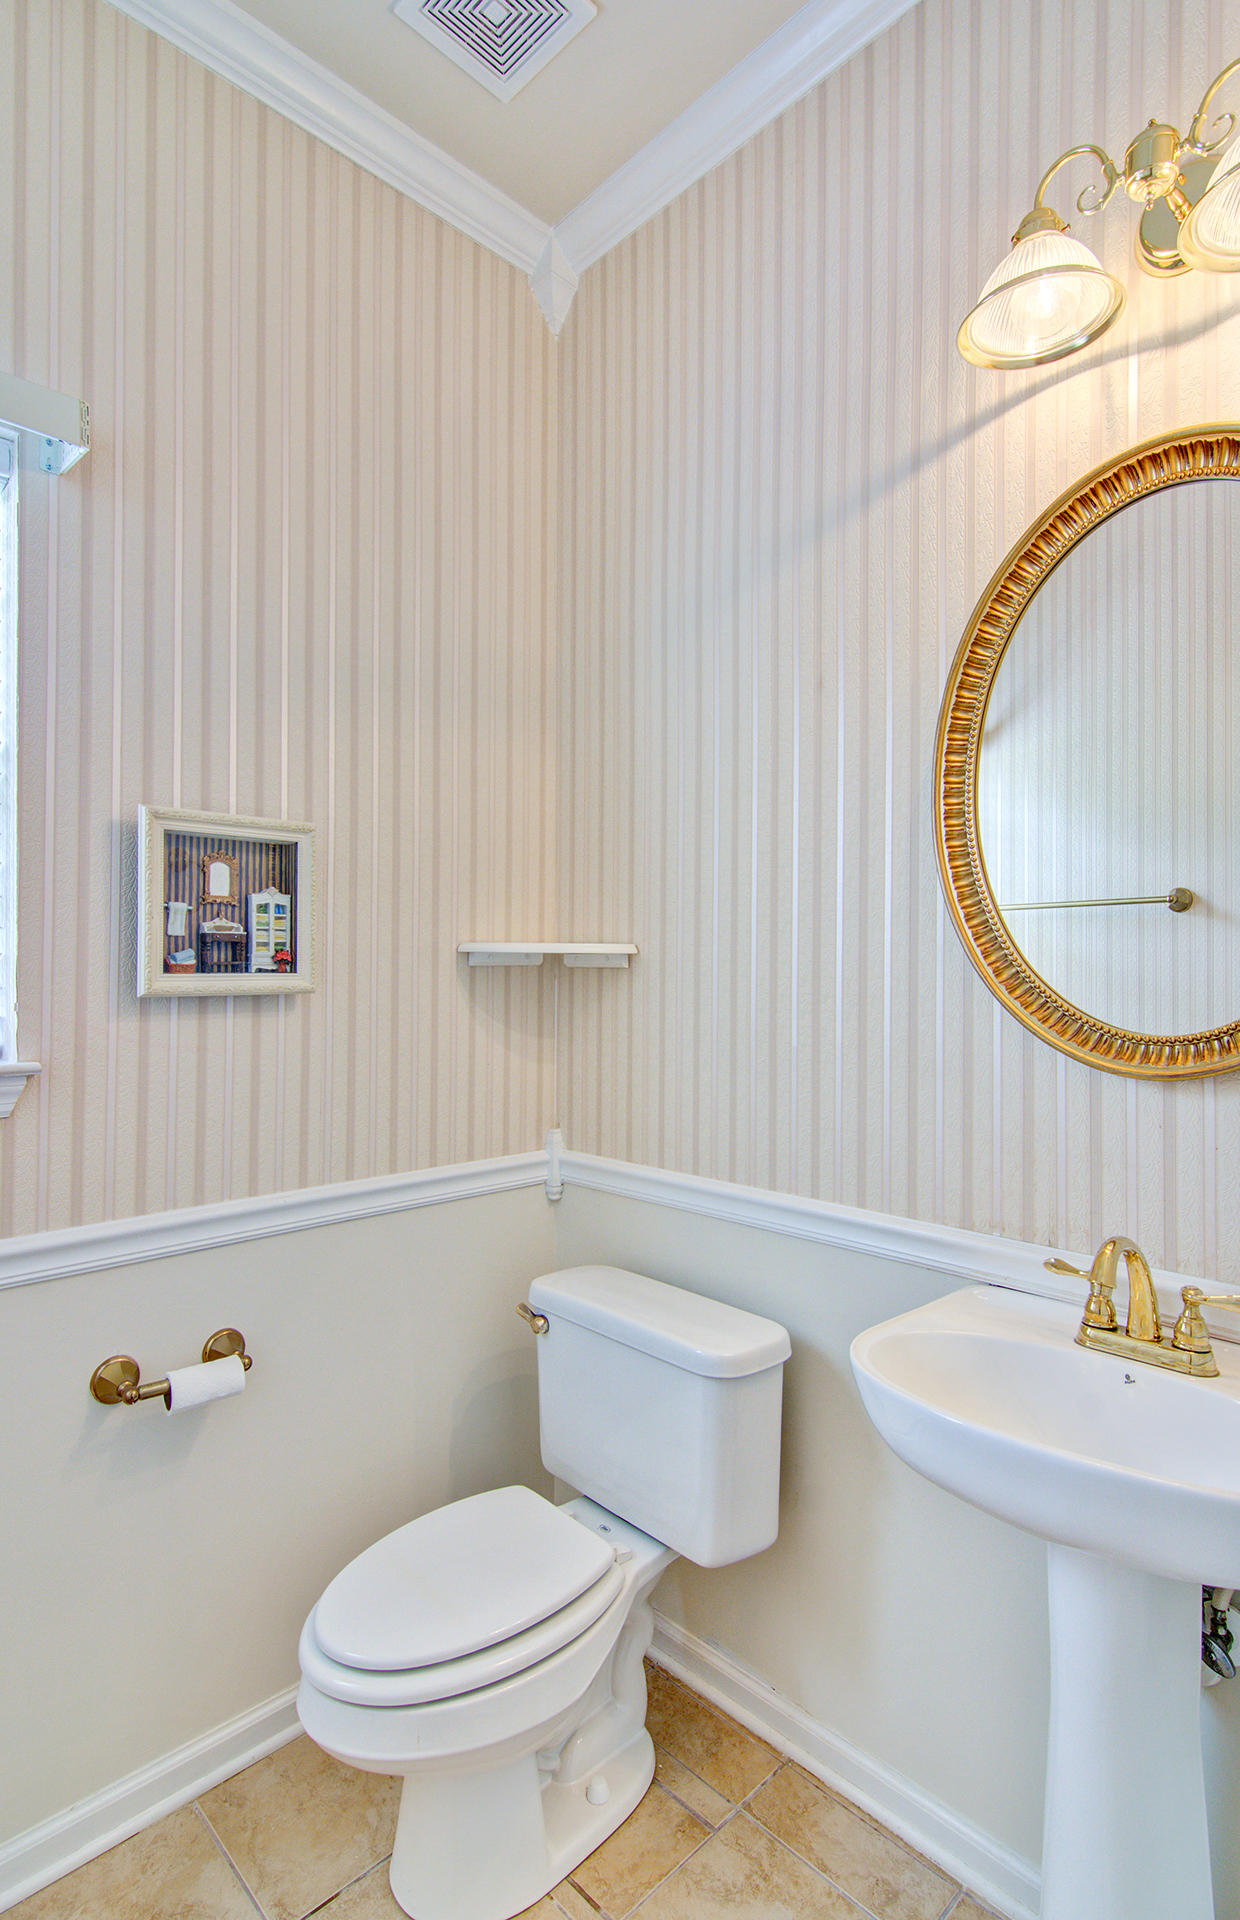 Grand Oaks Plantation Homes For Sale - 1013 Tyron, Charleston, SC - 14